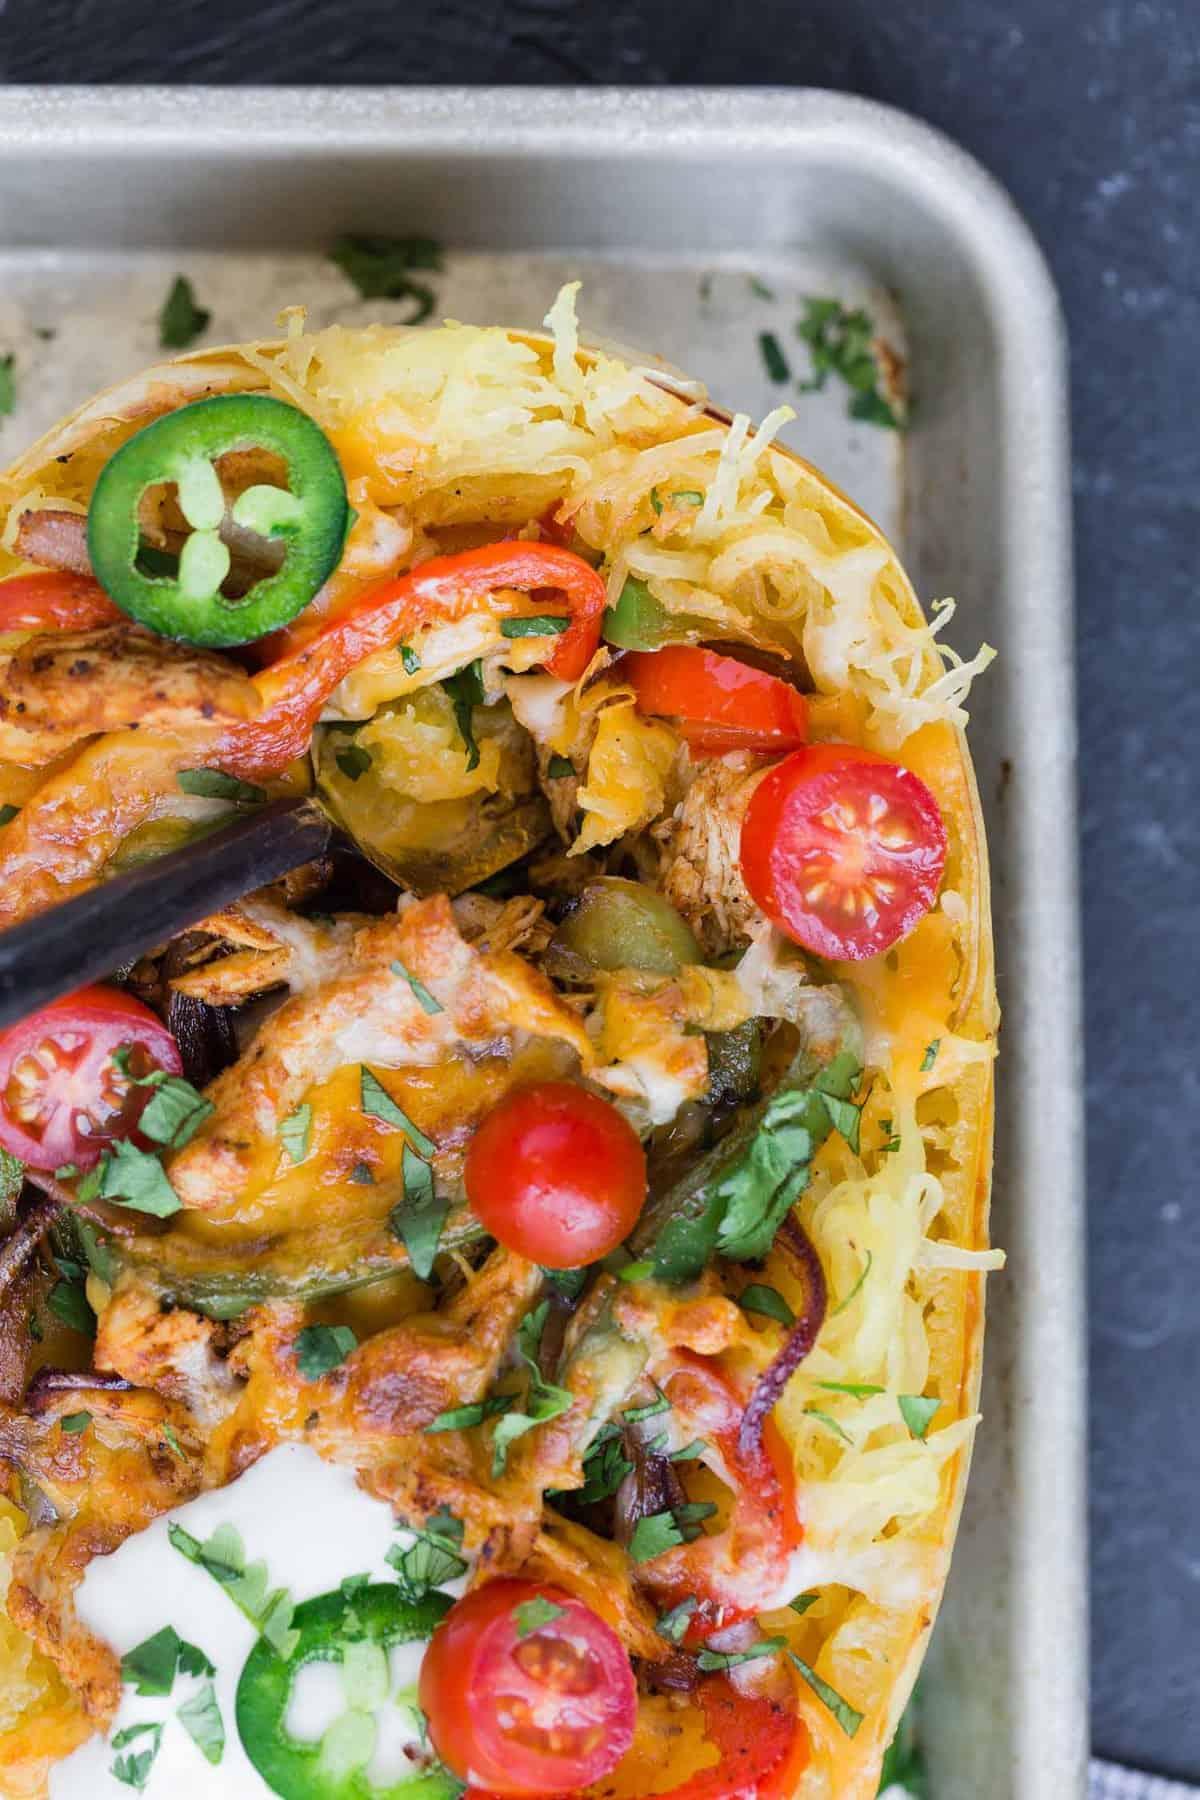 Close up of a chicken fajita stuffed spaghetti squash with toppings.